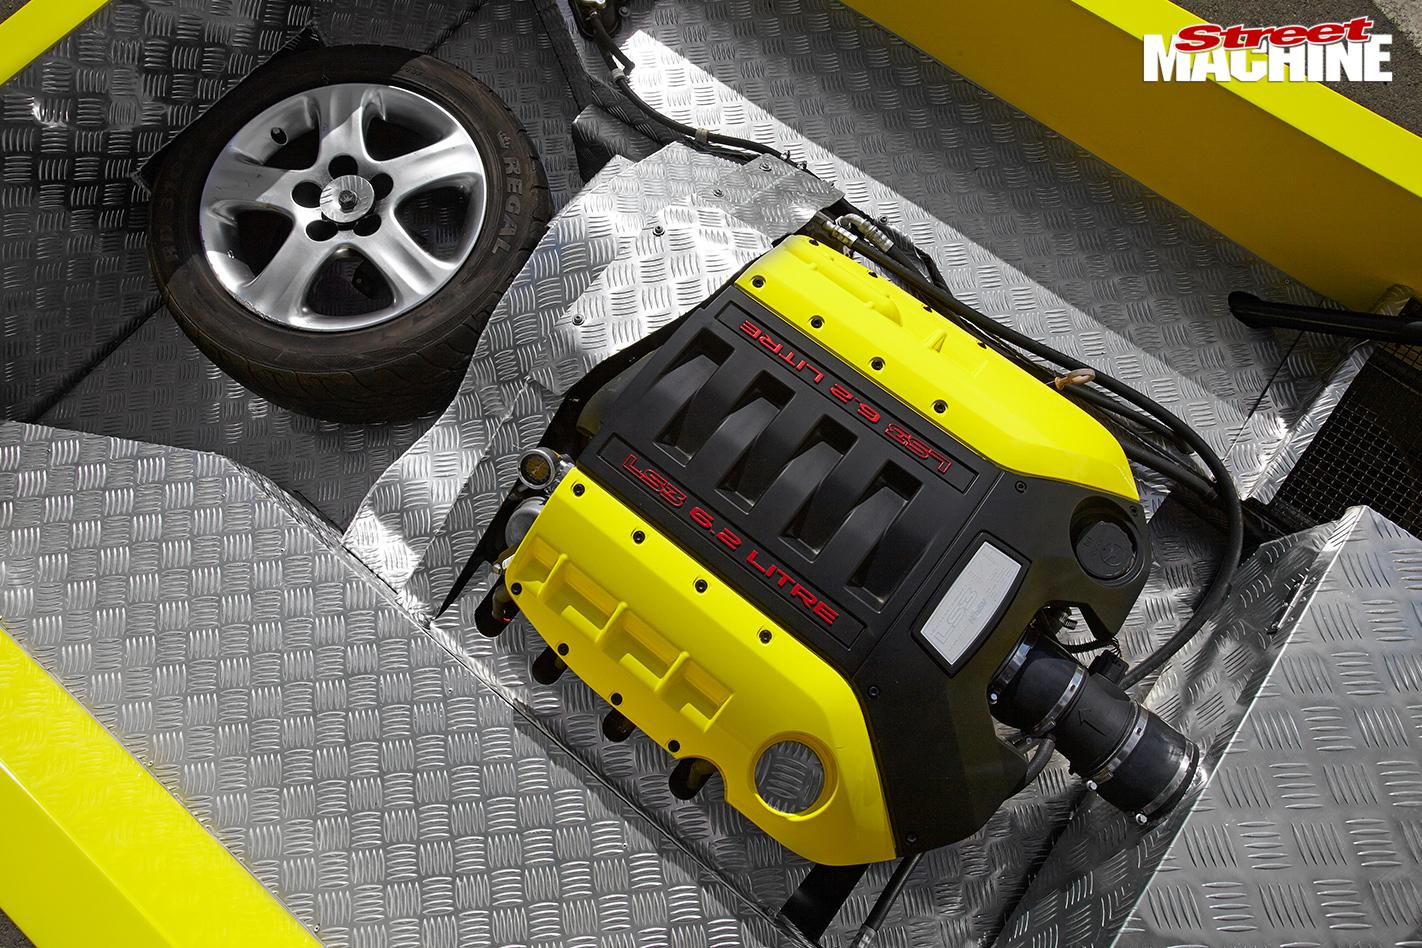 Hsv Ls 3 V8